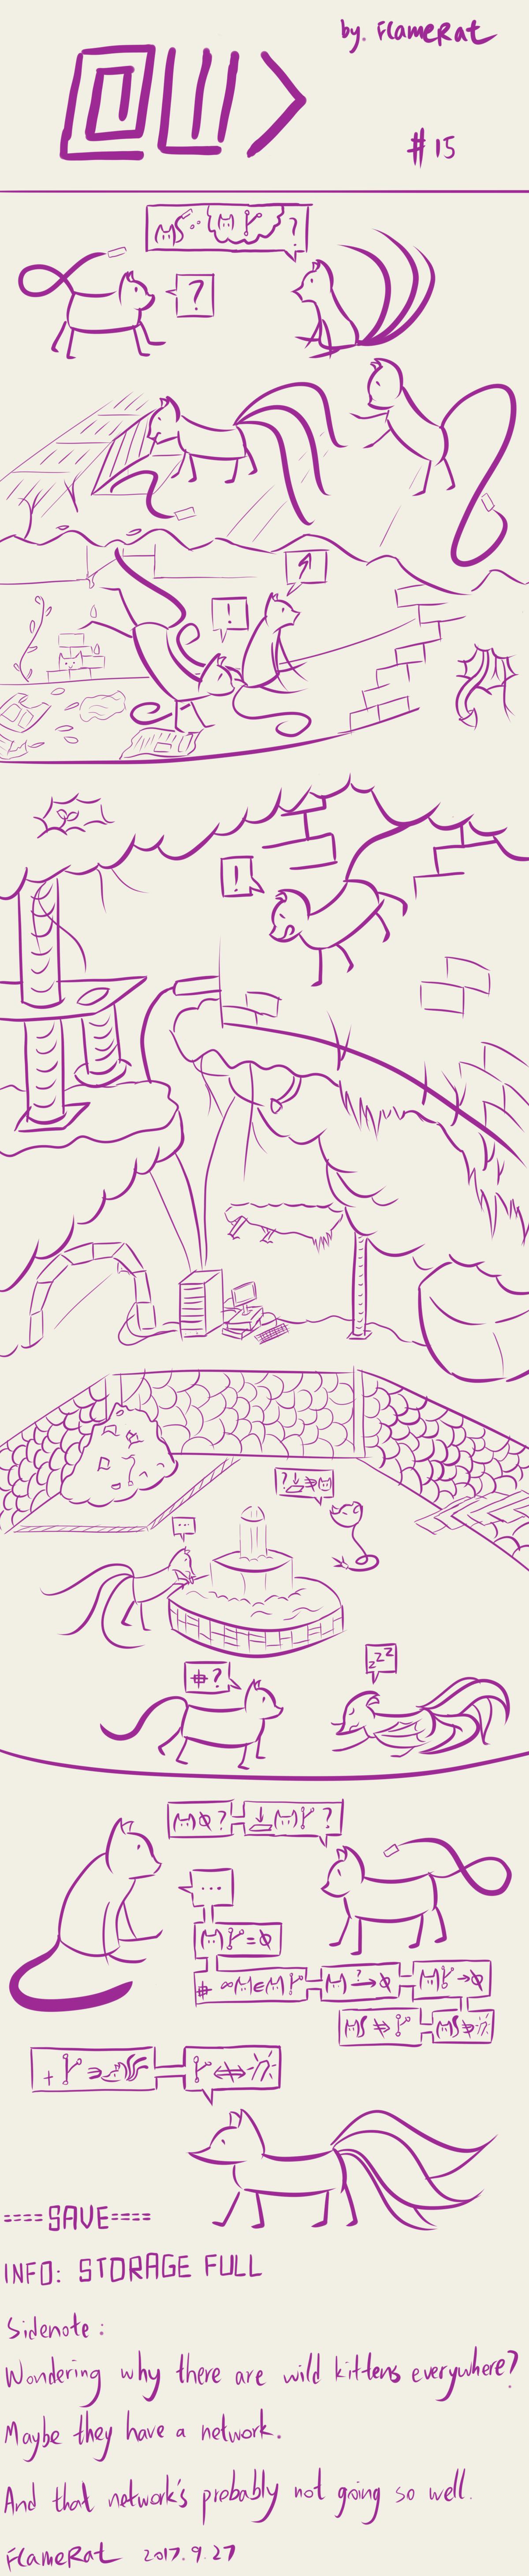 [Comic] At Wild Do #15 by FlameRat-YehLon